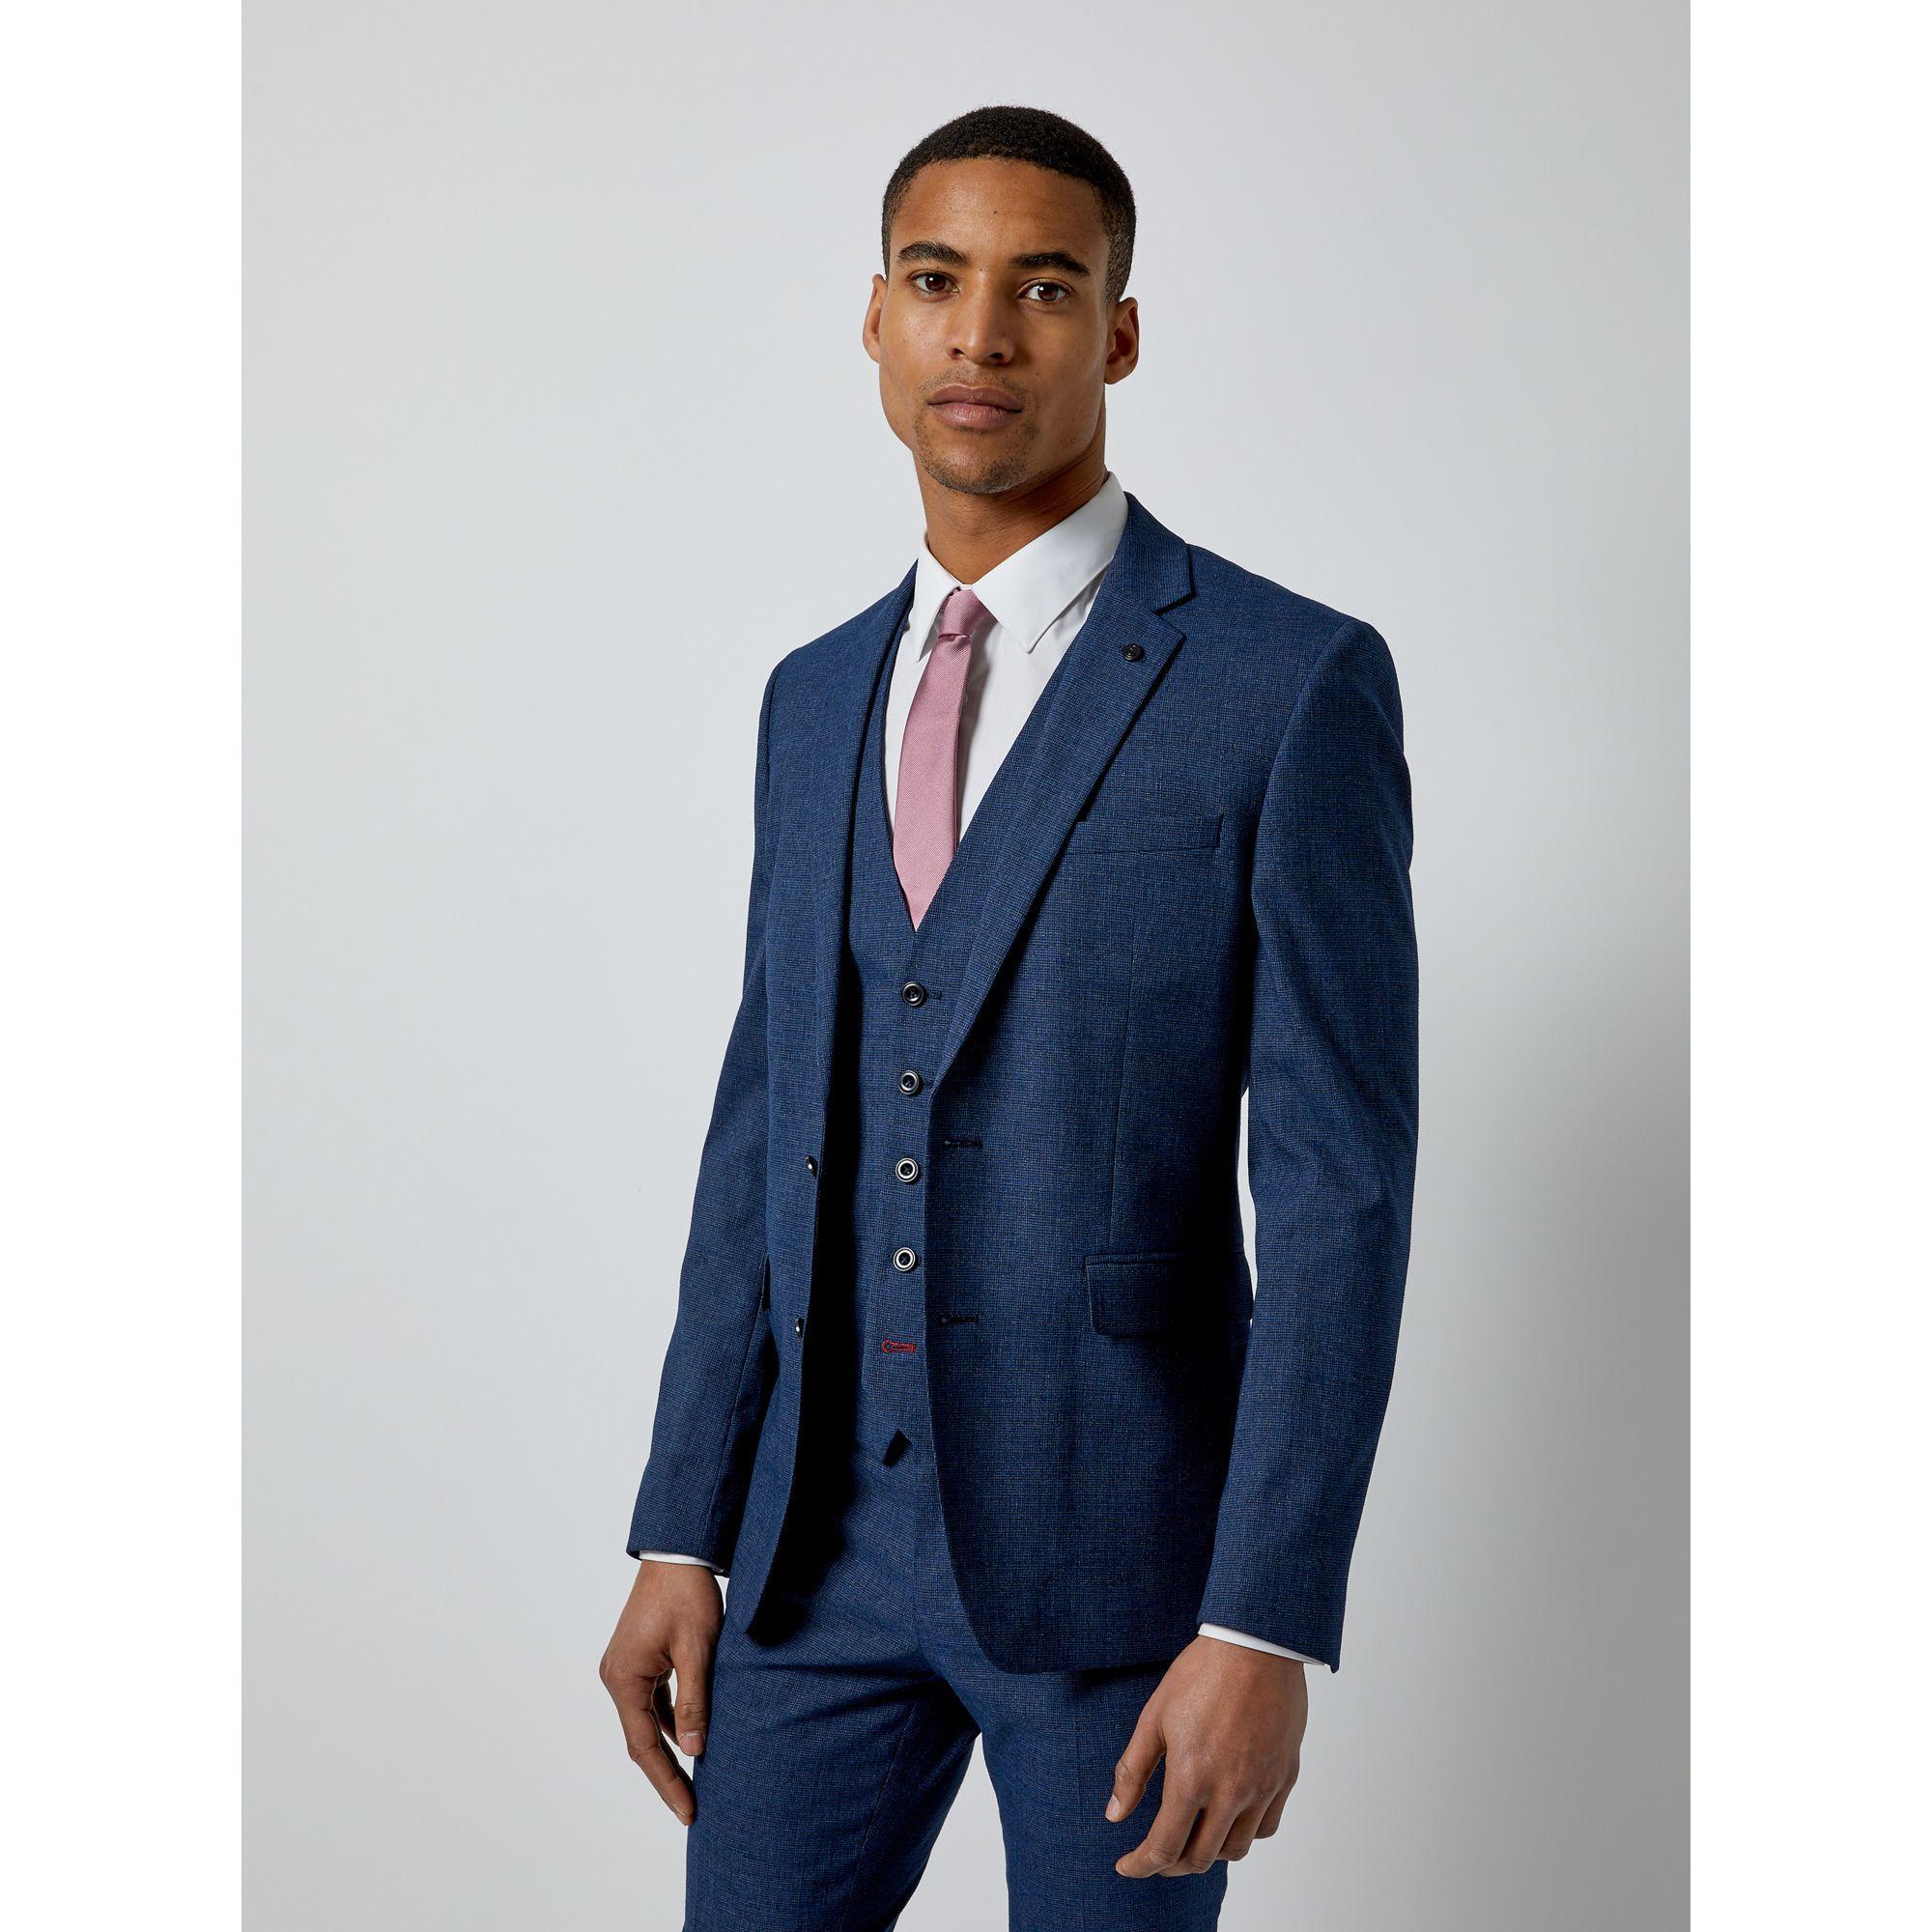 424334cec817 Burton - Blue Textured End On End Skinny Fit Suit Jacket for Men - Lyst.  View fullscreen